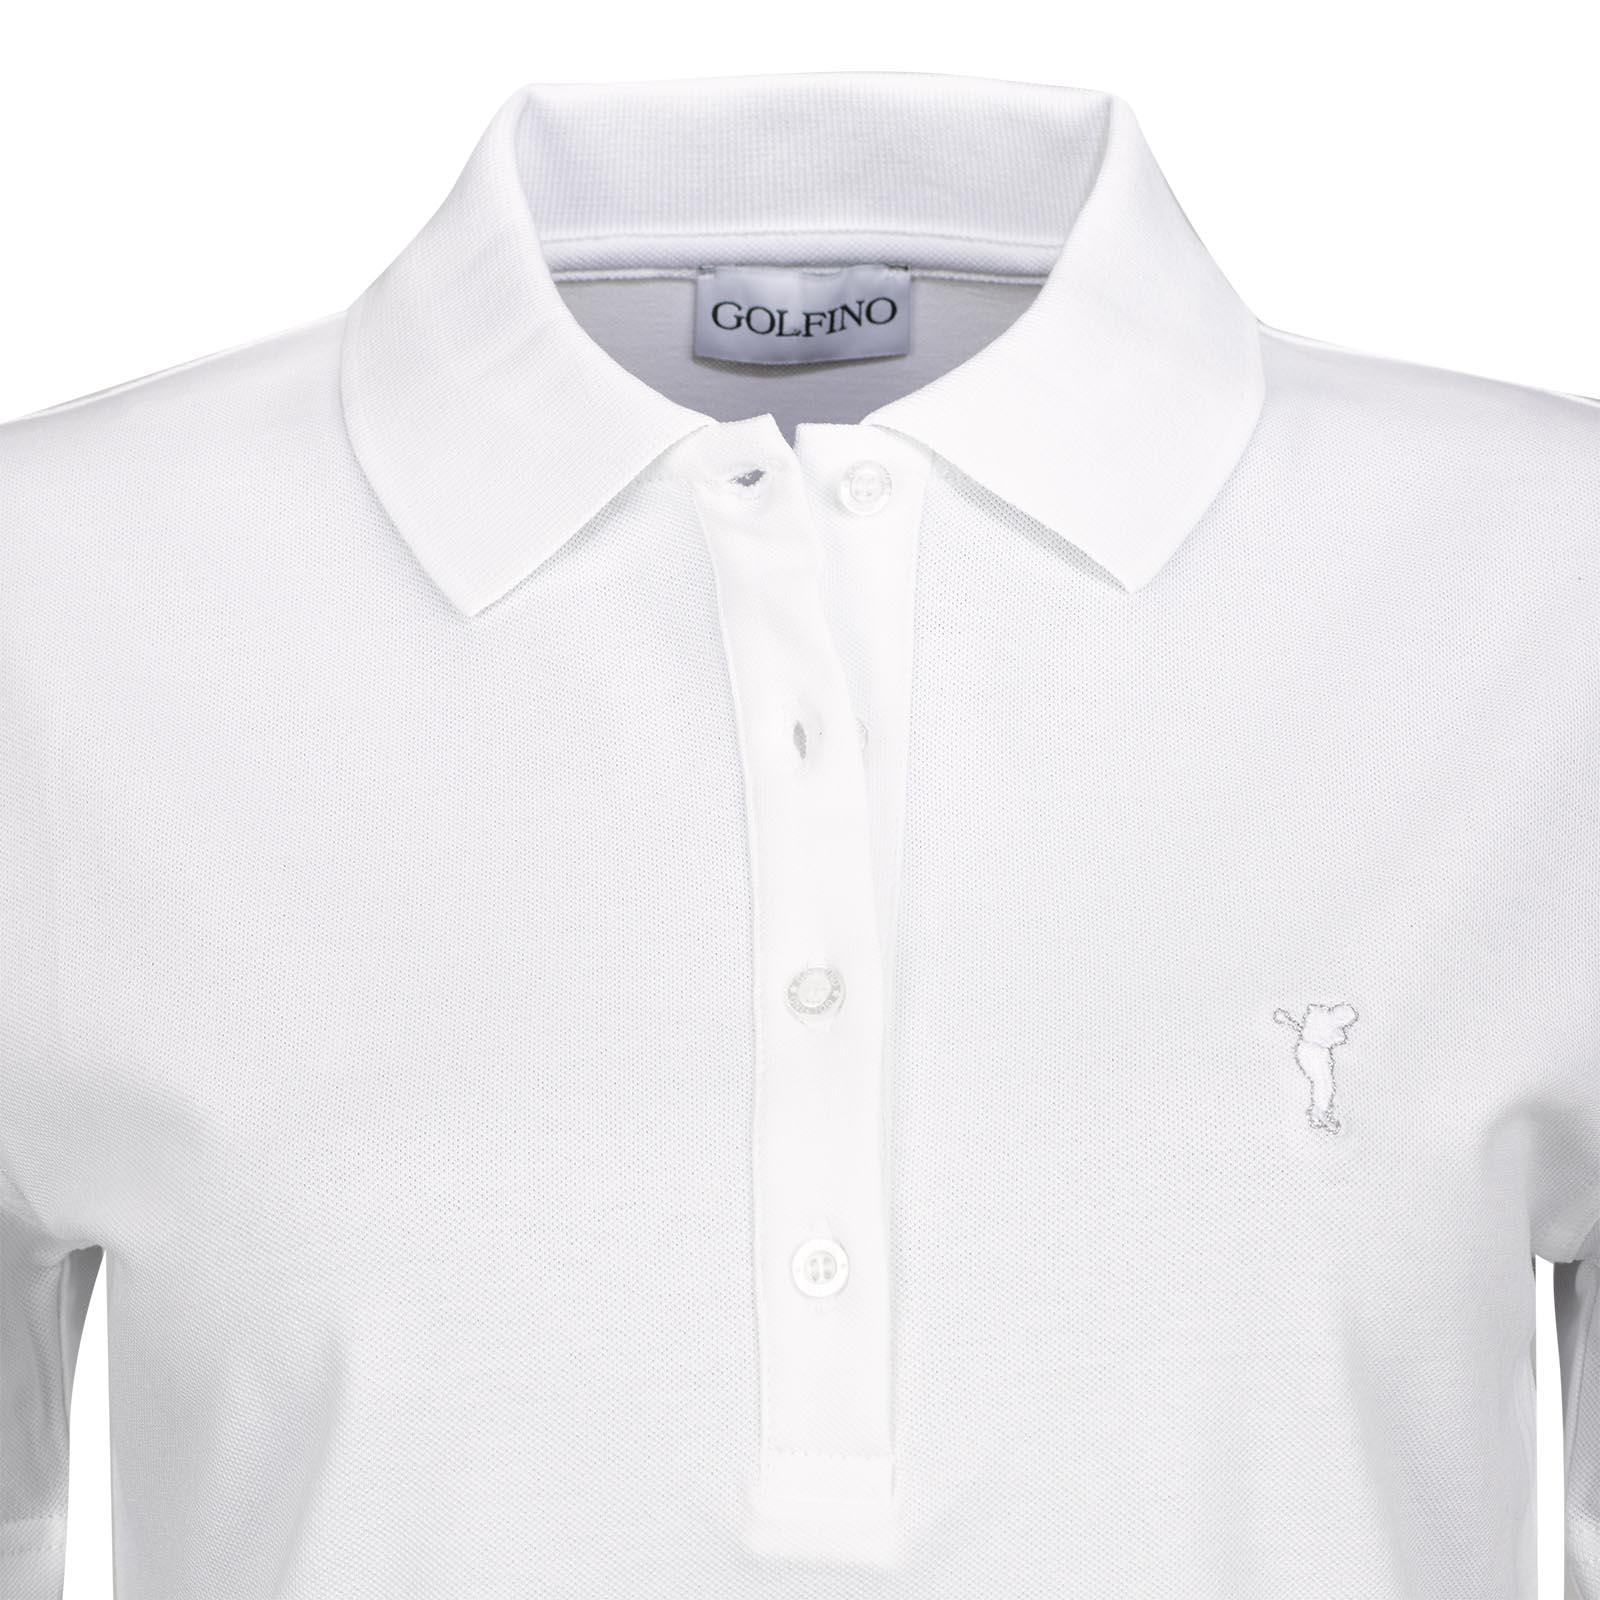 Basic Cotton Blend Damen Kurzarm Golf-Polohemd mit Stretchfunktion